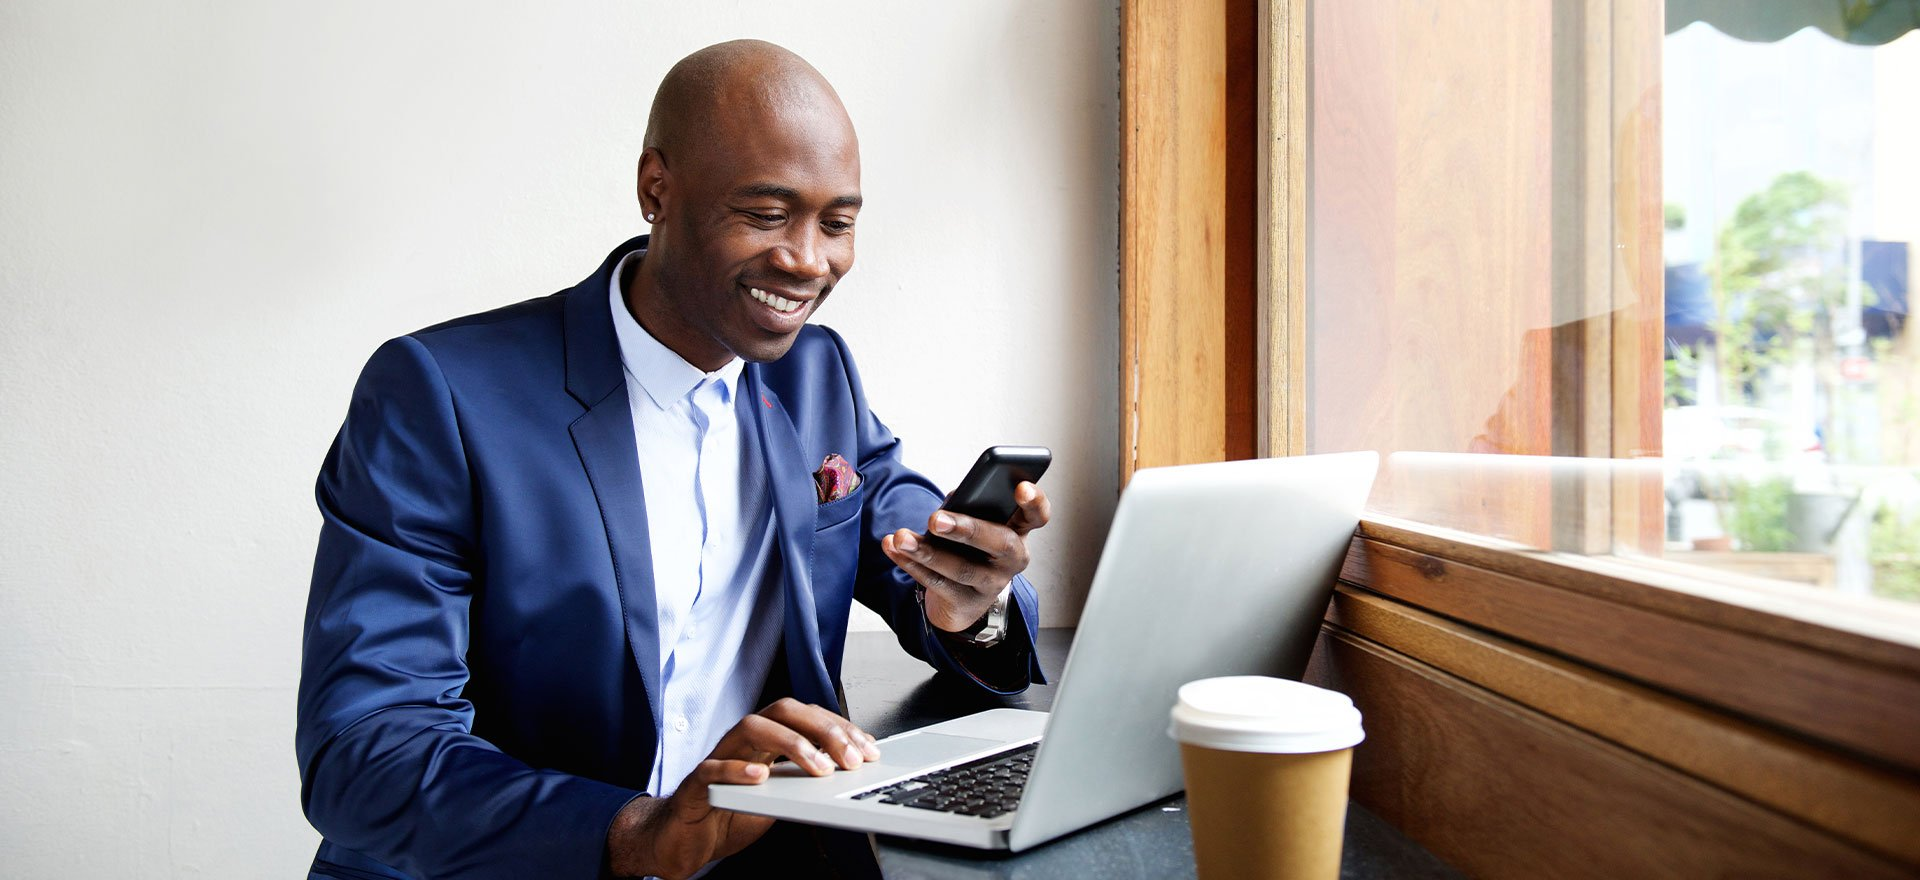 Business man checking phone